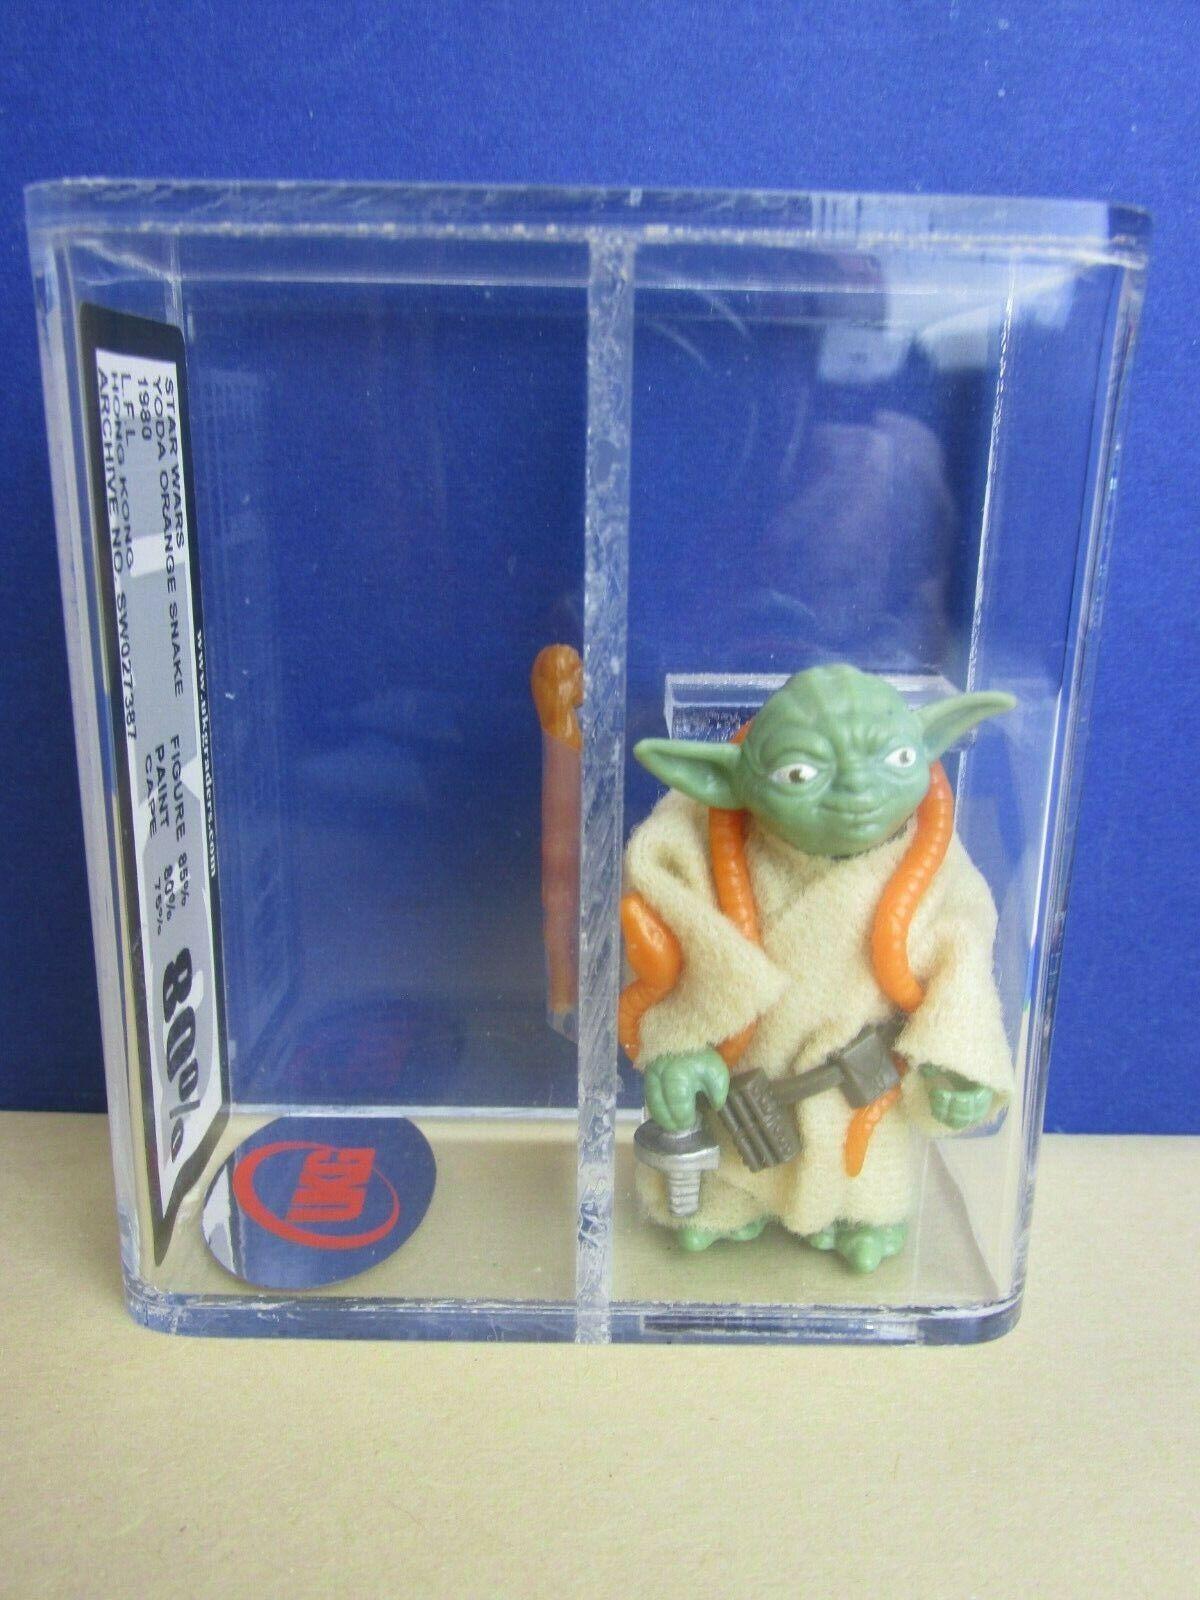 Star Wars Vintage Maître Yoda Figurine Original Orange Serpent UKG pas AFA